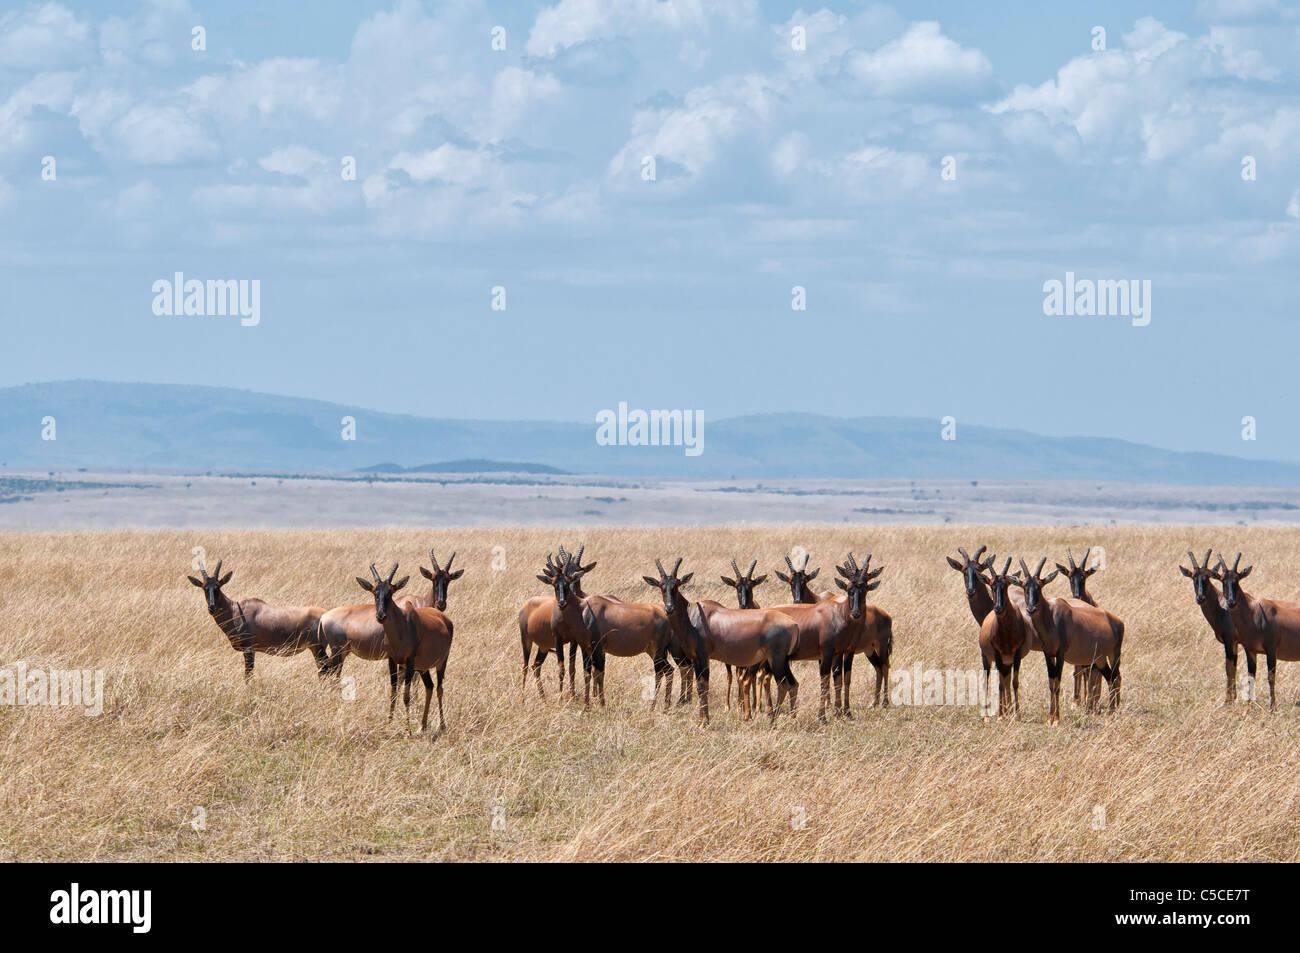 Herd of Topi, Damaliscus lunatus, on the plain of the Masai Mara, Kenya, Africa - Stock Image